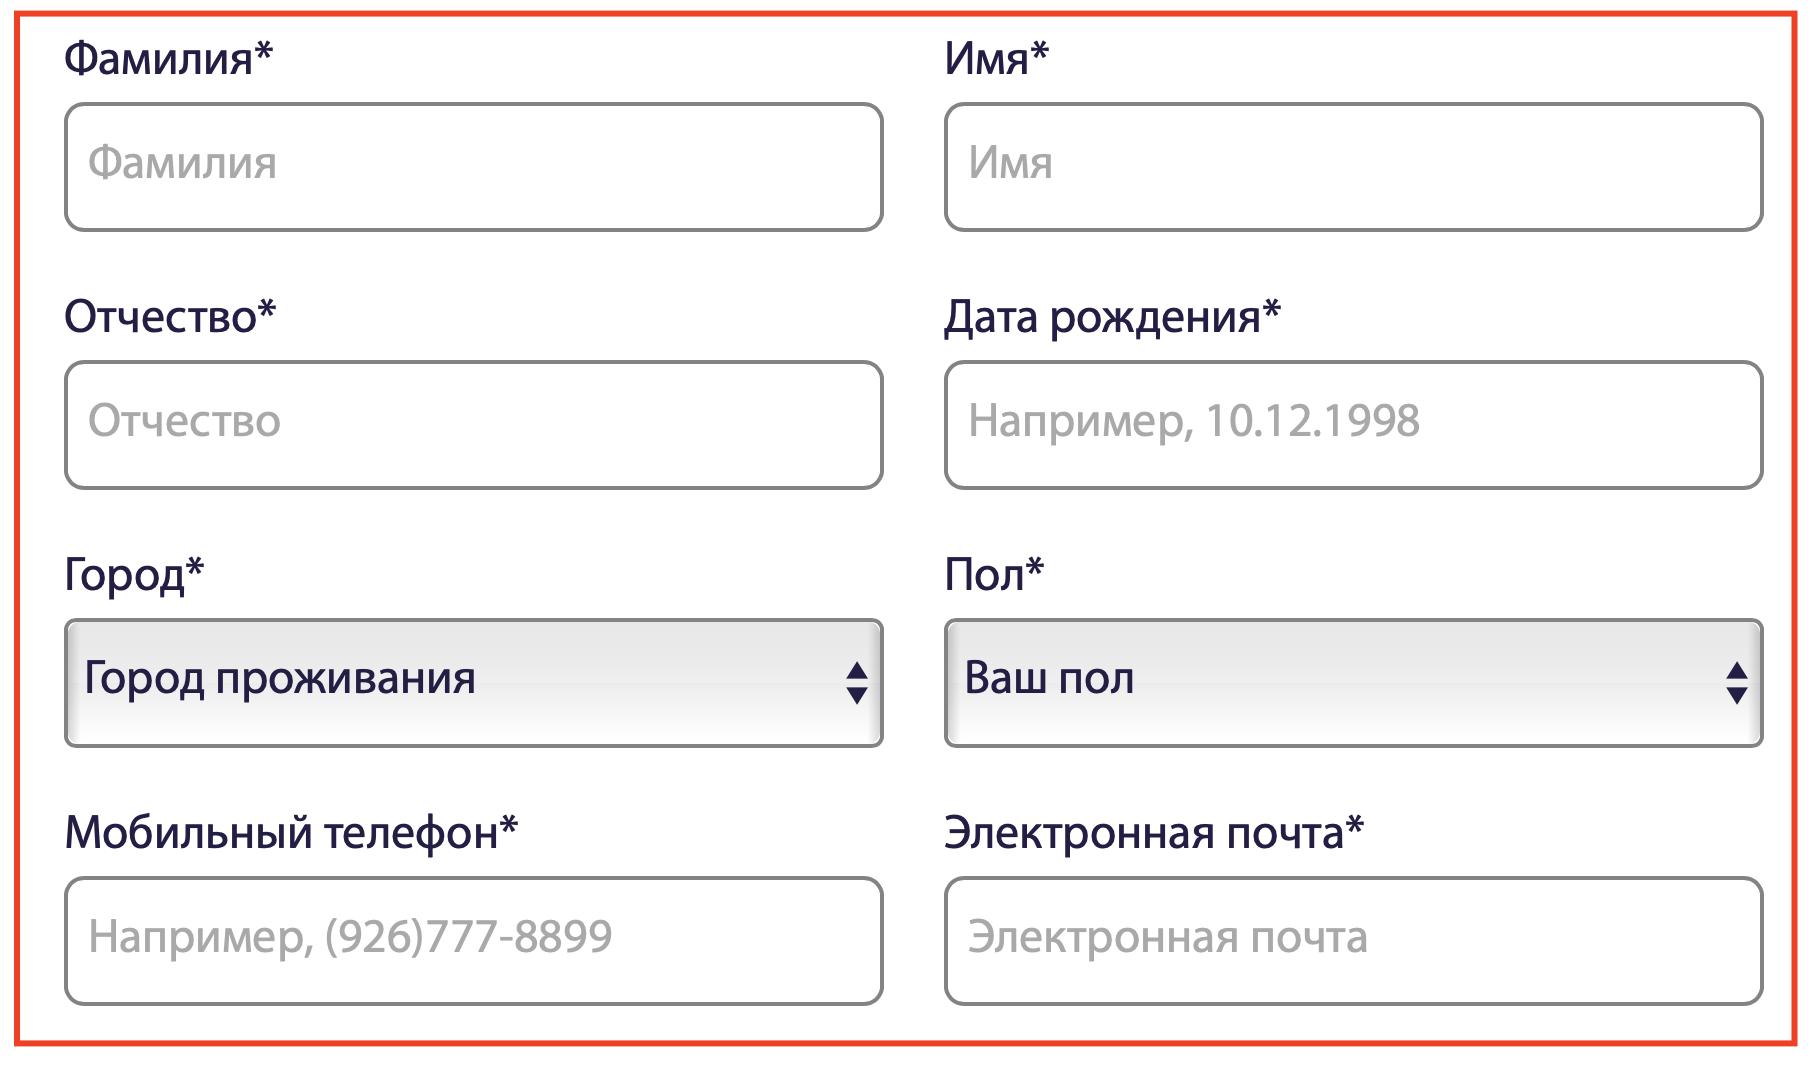 Заявка Урбан карта